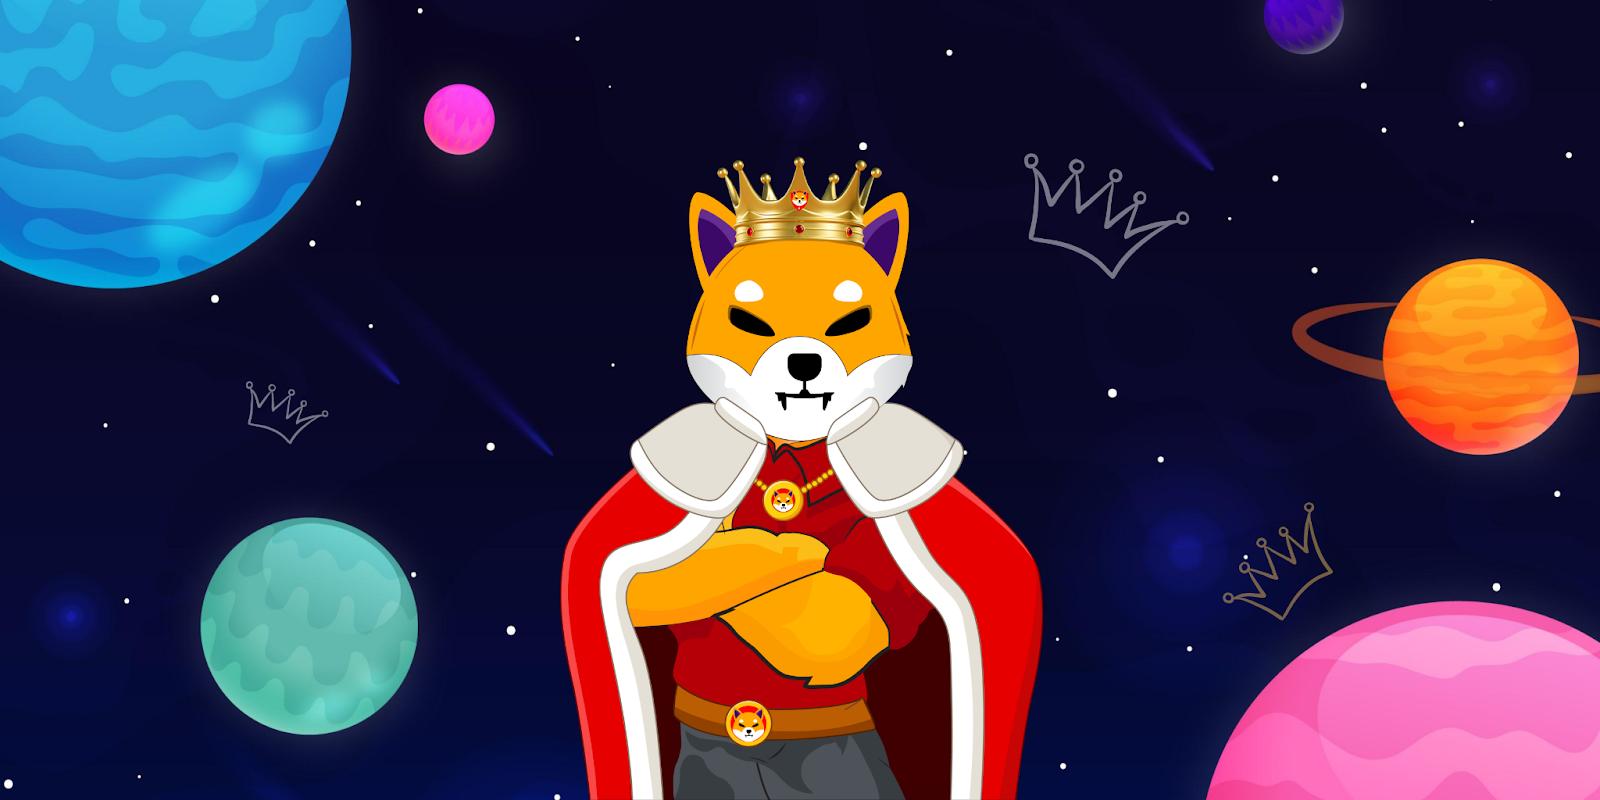 Introduction to KING SHIBA